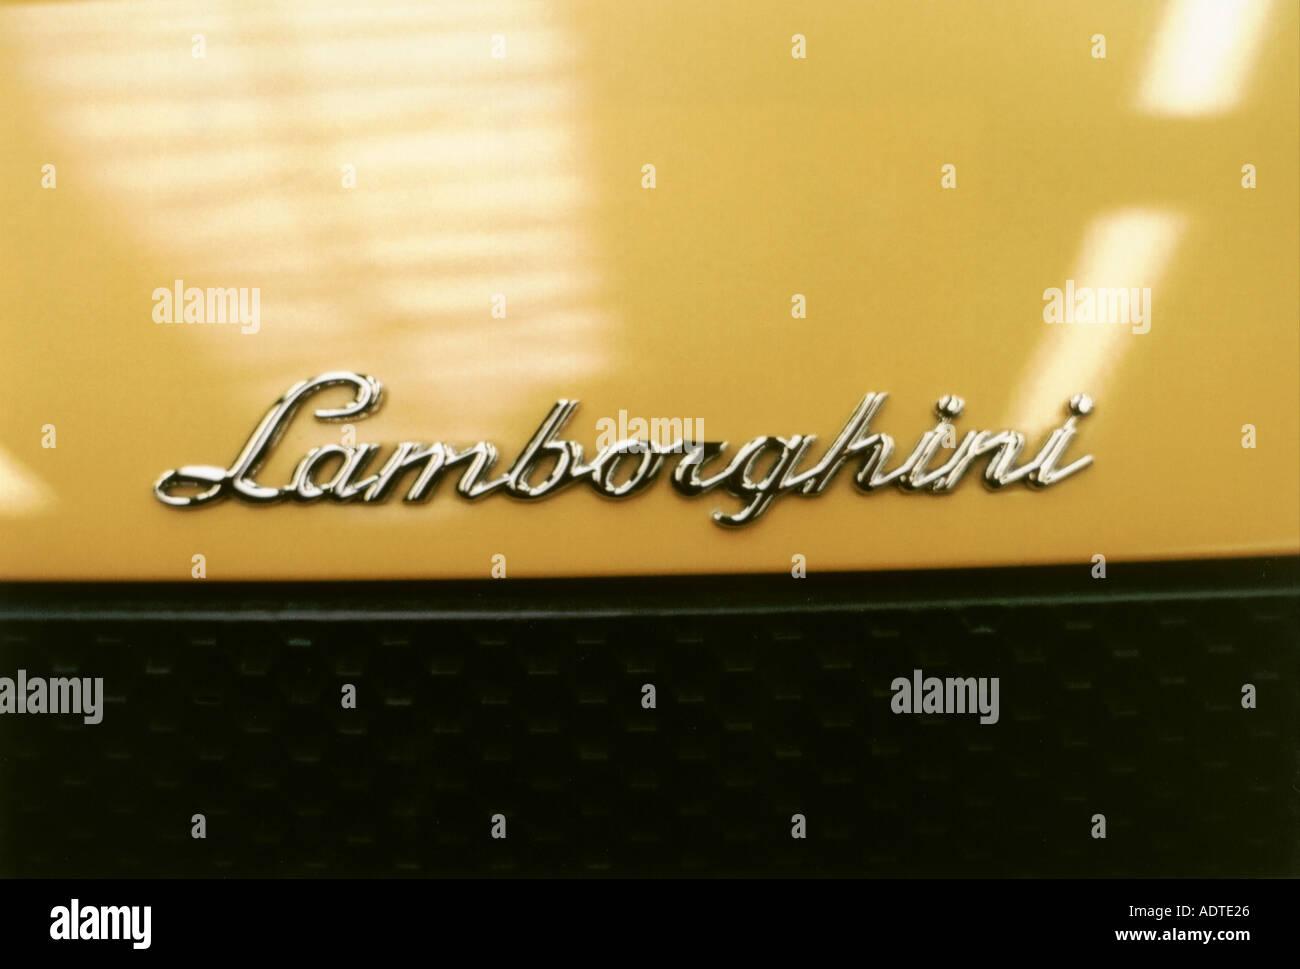 Lamborghini Murcielago Logo Name Automobile Motorcar Vehicle Brand